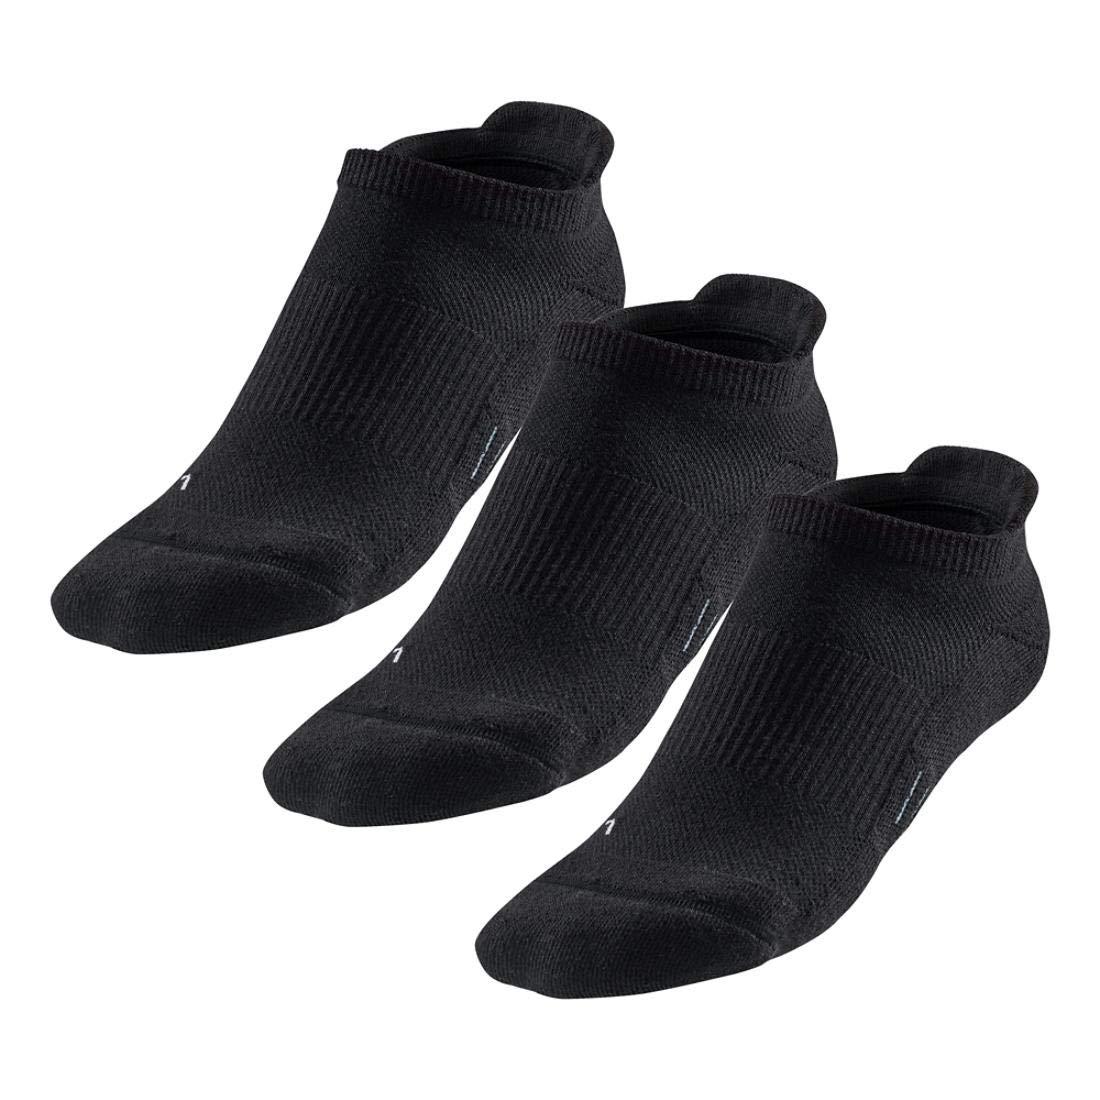 R-Gear Women's No Show Running Socks (3-Pack) | Super Femme, Super Cute, Super Dry, Black/ThinCushion, S/M